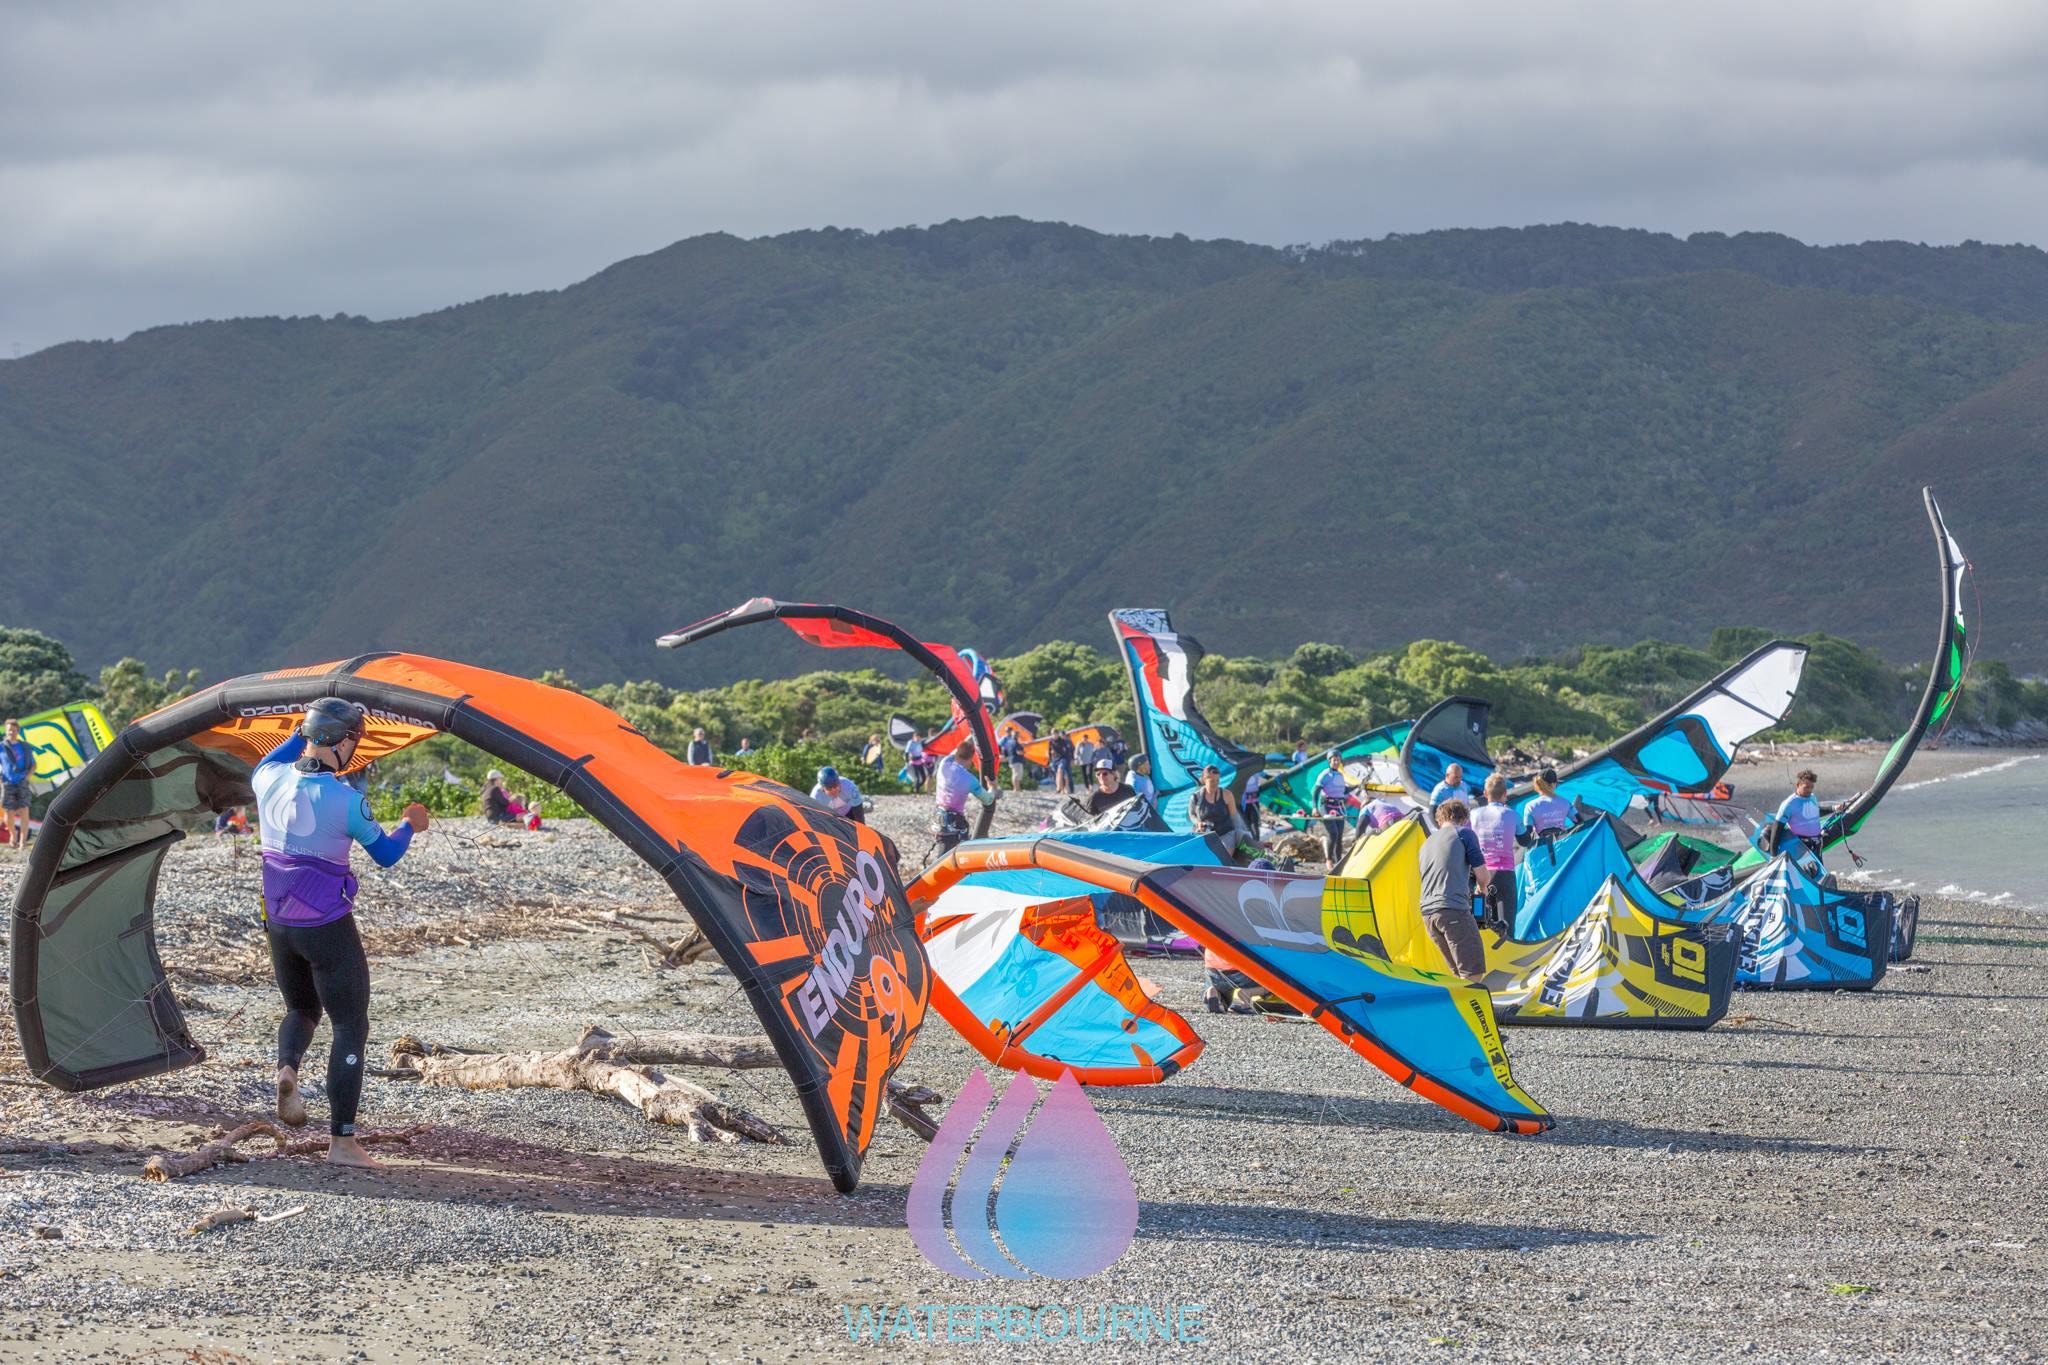 kitesurfer-wellington-new-zealand